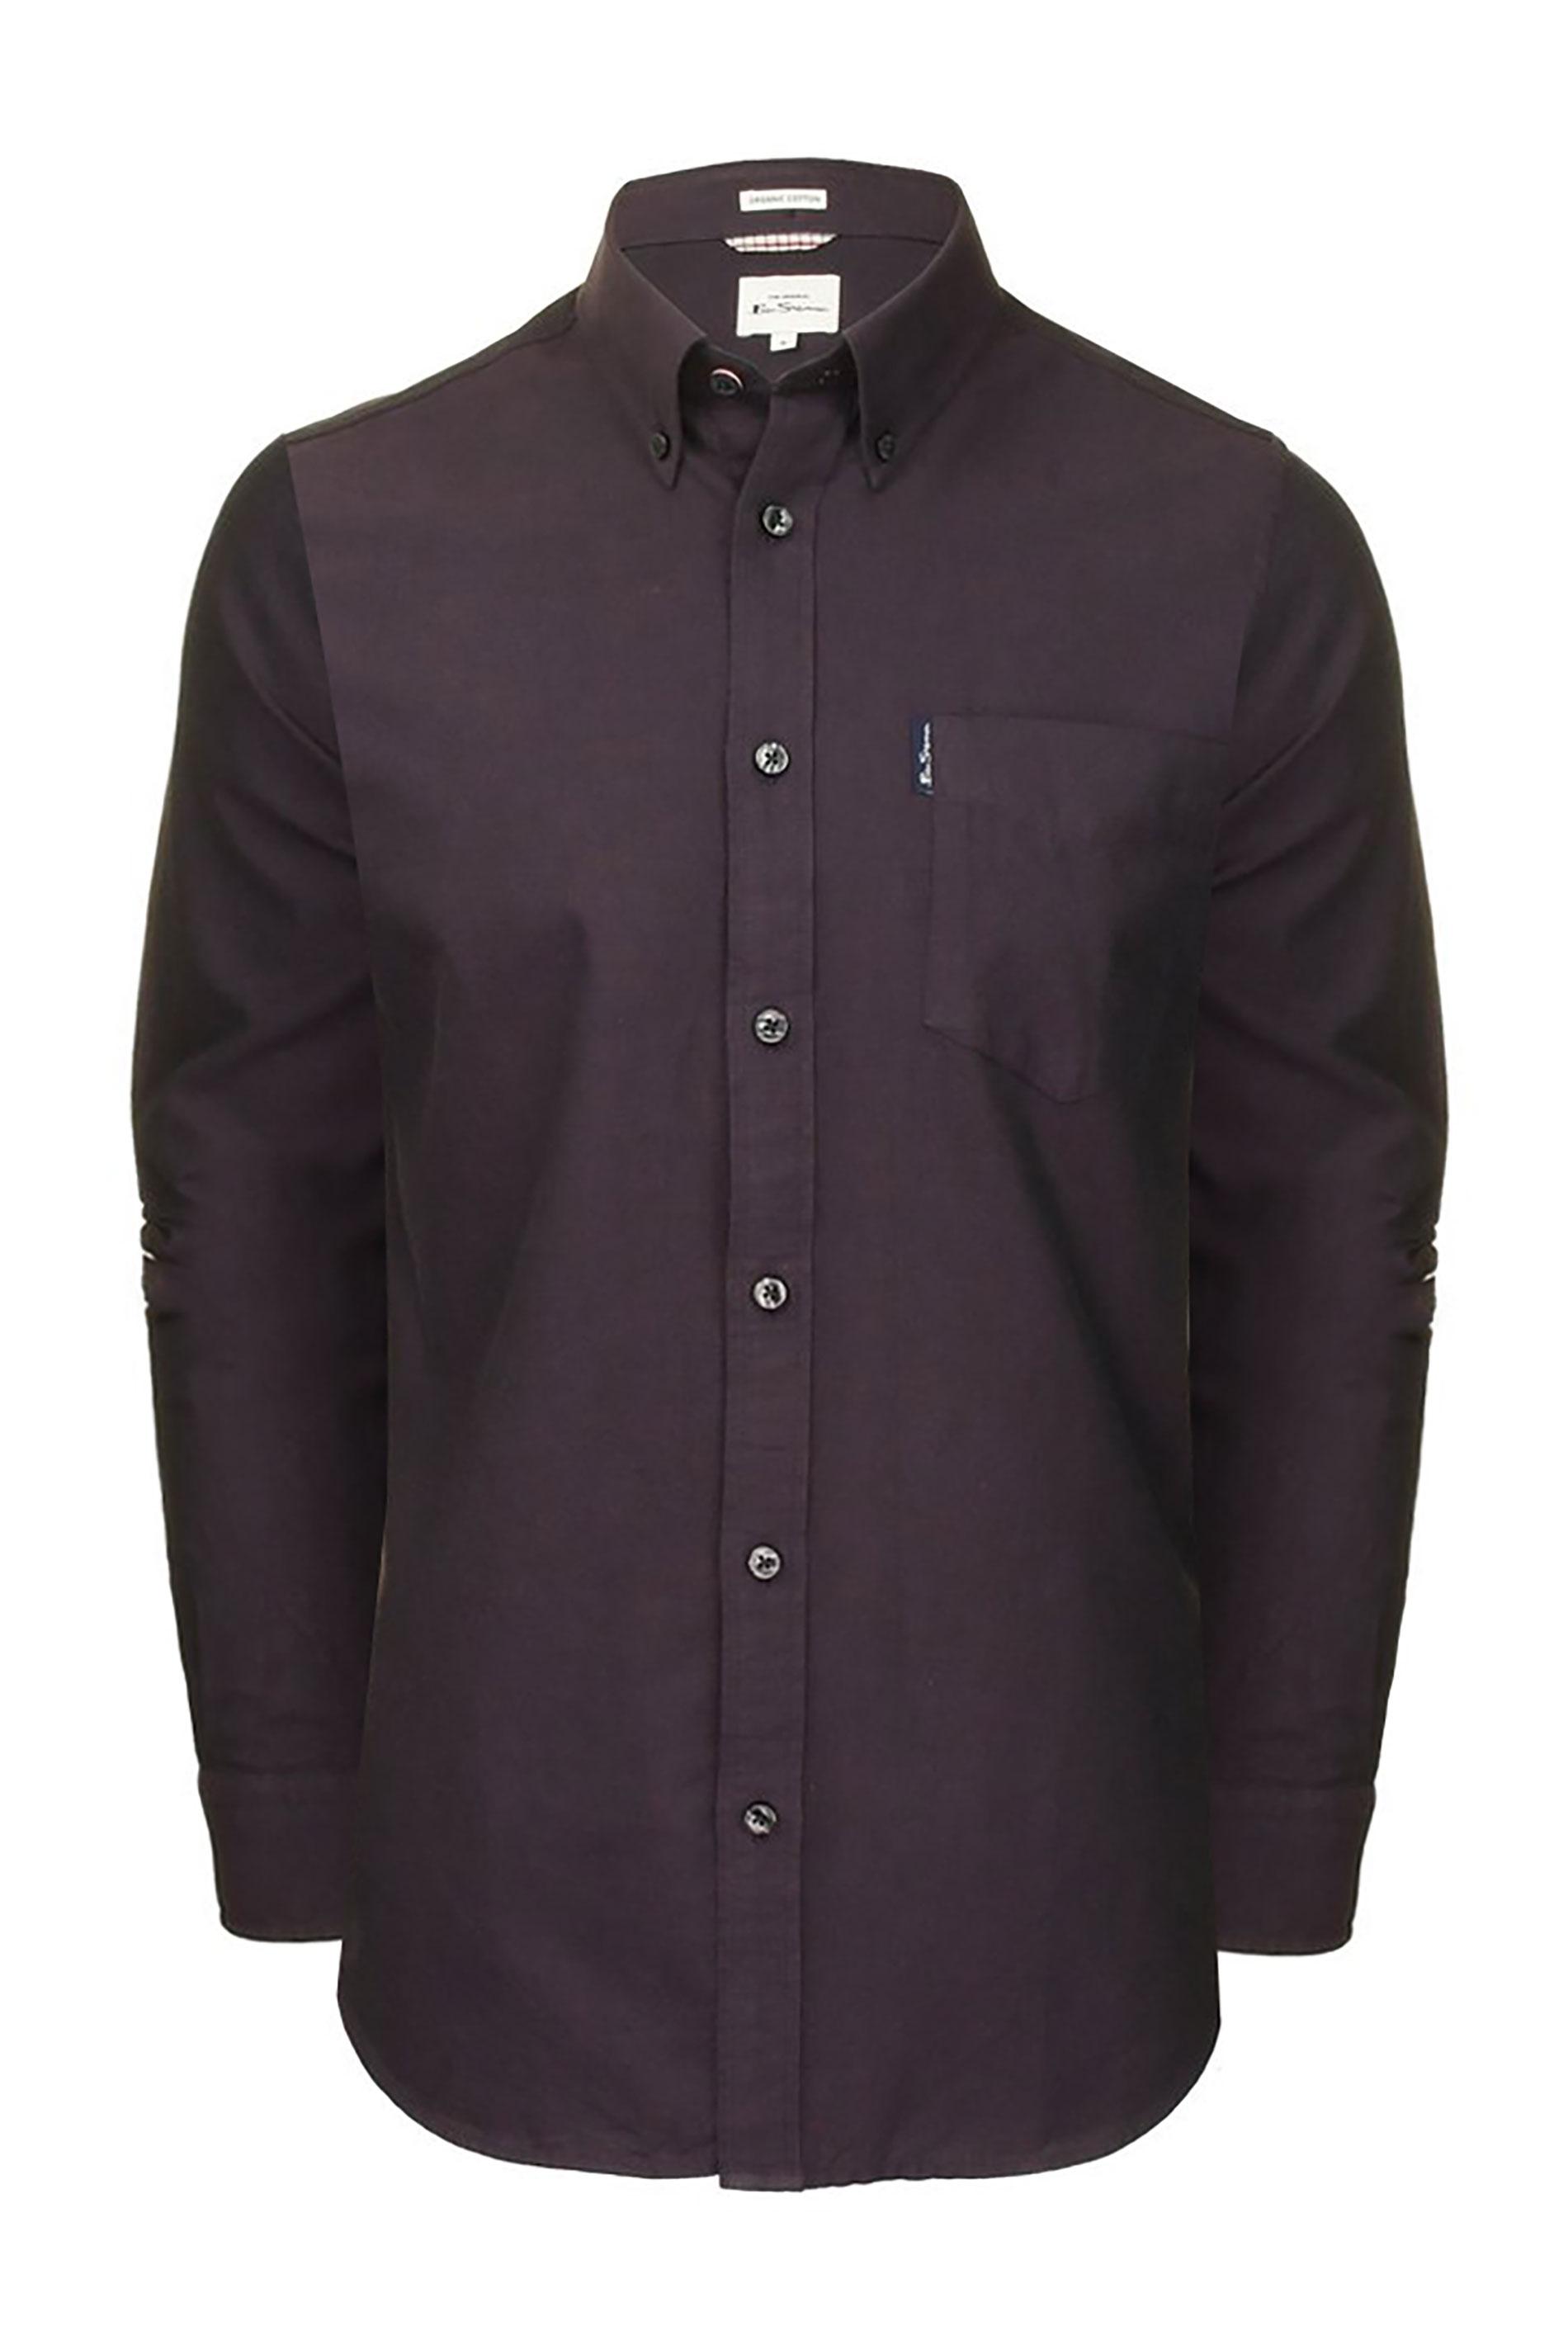 BEN SHERMAN Dark Purple Signature Long Sleeve Oxford Shirt